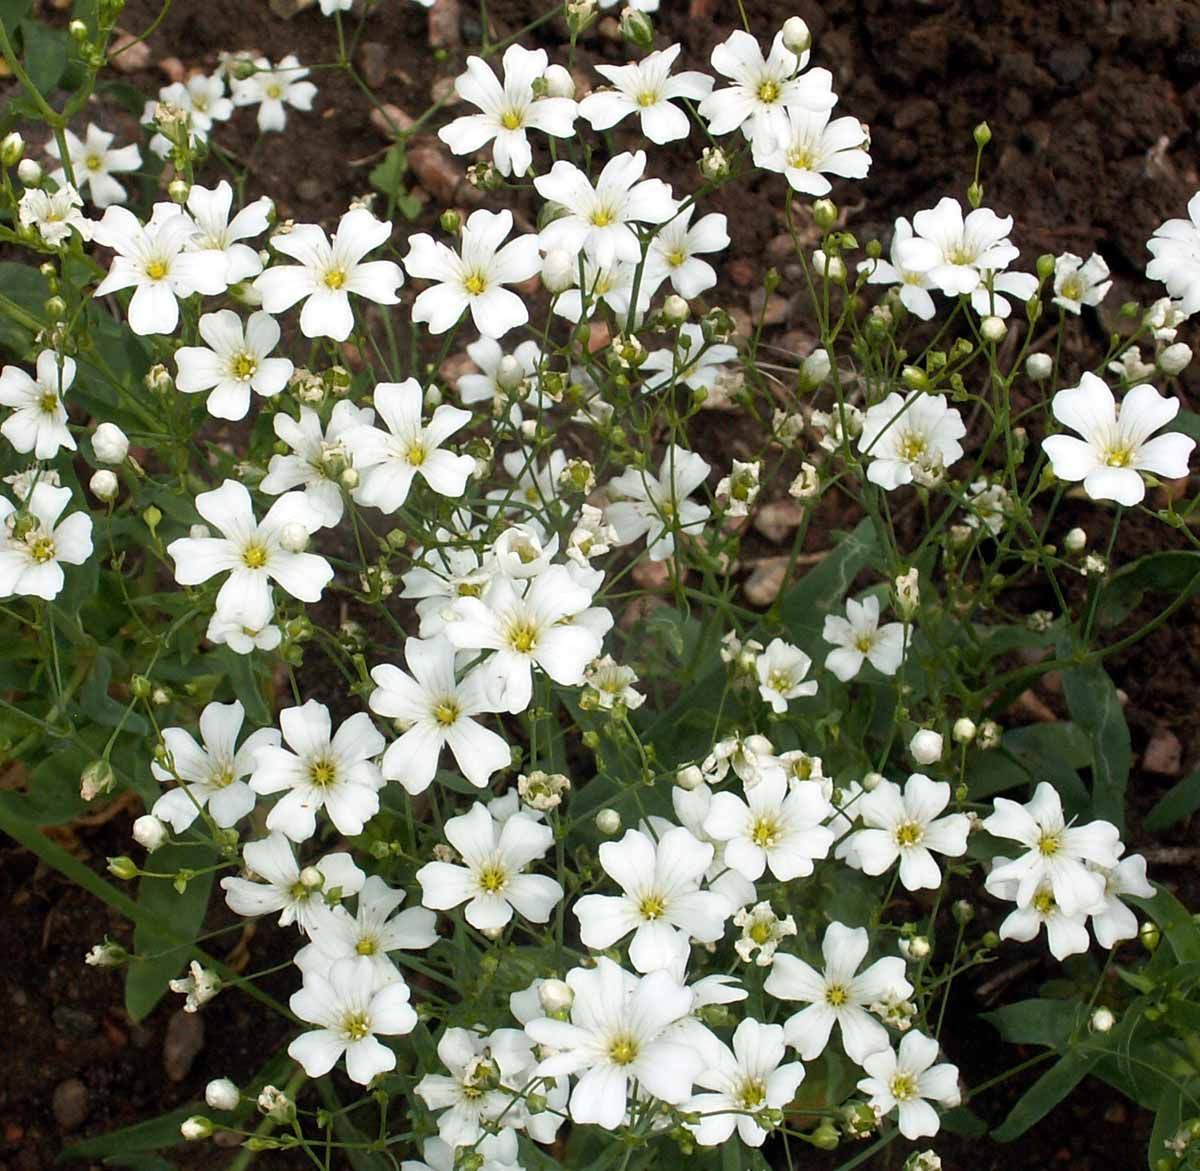 Gypsophila Elegans Babys Breath Flowers Gypsophila Elegans Flower Seeds